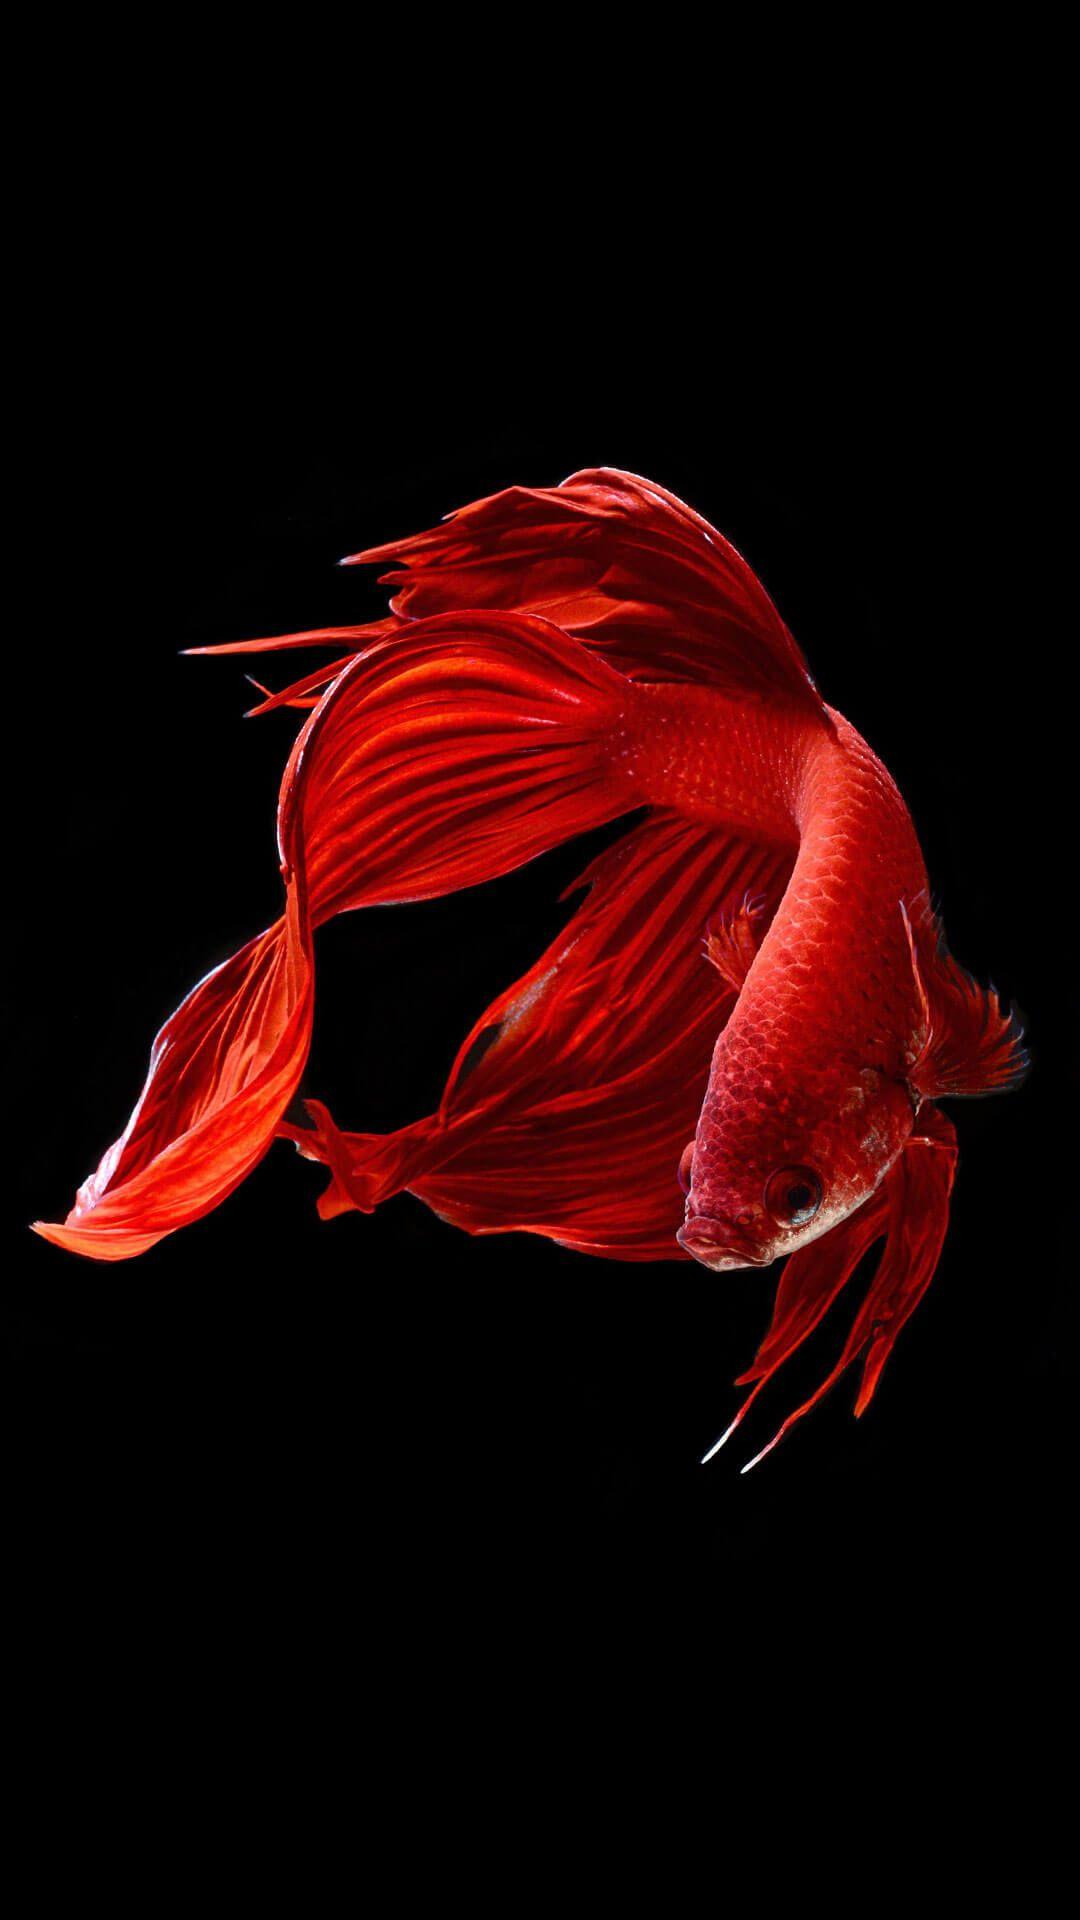 Wallpaper iphone fish - Betta Fish Wallpaper Ios 9 Hd